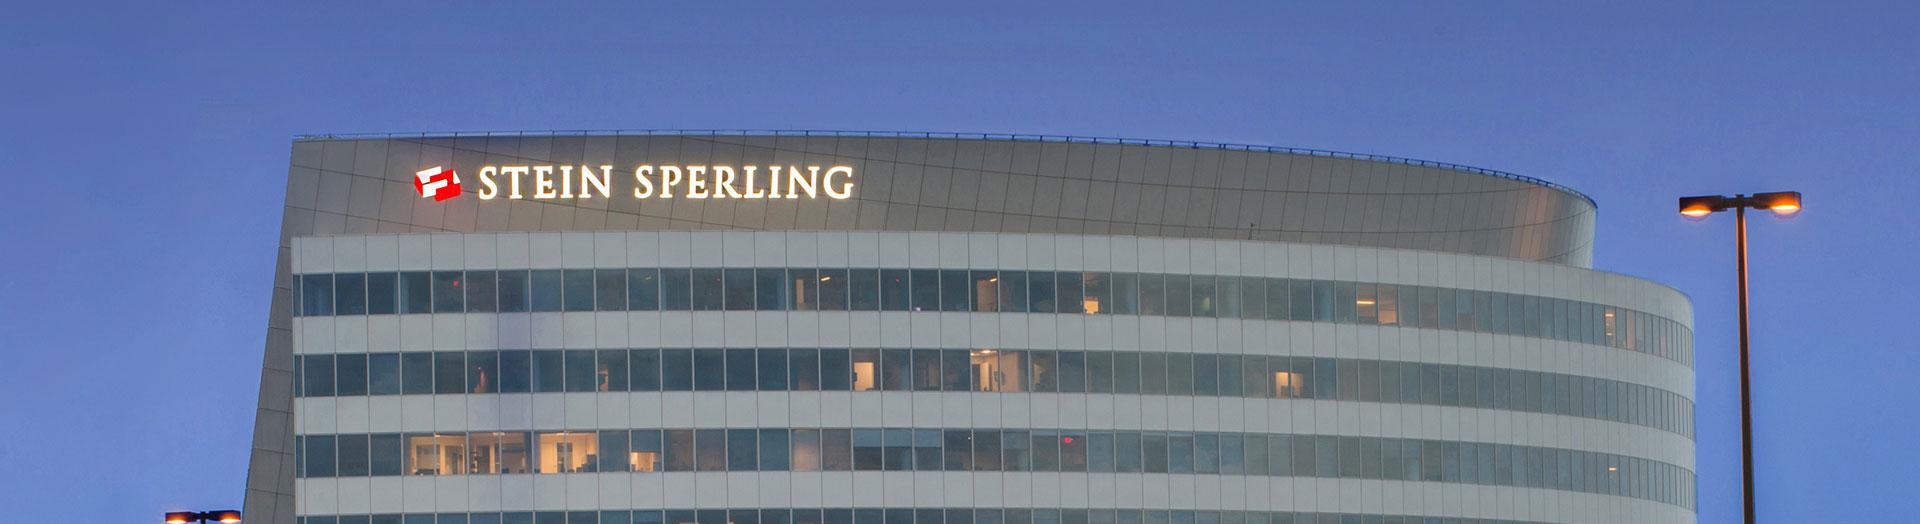 Stein Sperling Office on Wootton Parkway